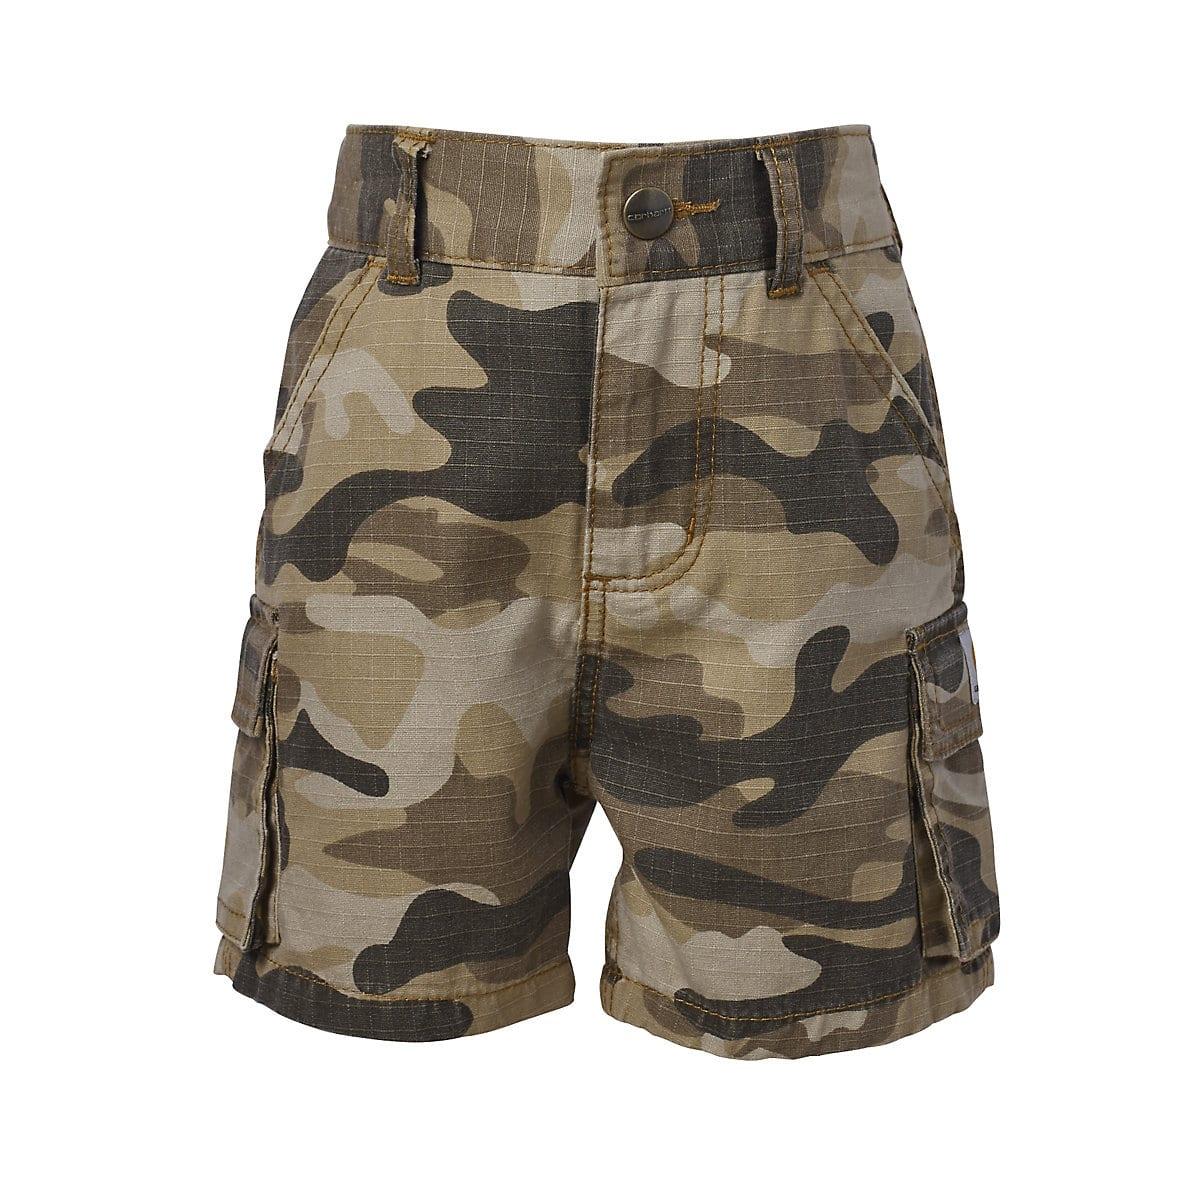 Helpful Size 4t Carhartt Camo Shorts Boys' Clothing (newborn-5t) Bottoms